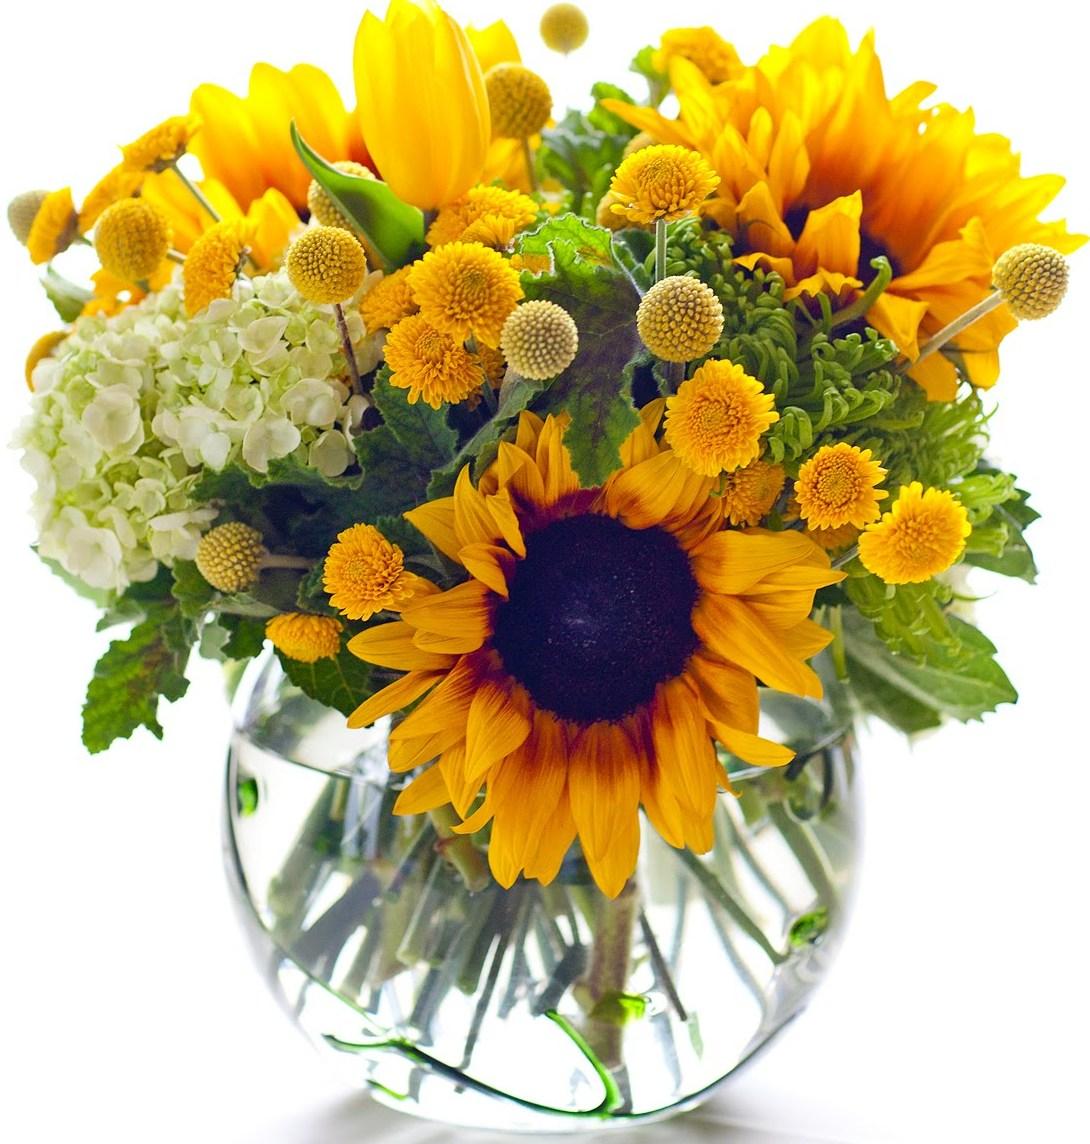 Tampungan Sunflower (Bunga, Buket, Kue-Permen & Card)